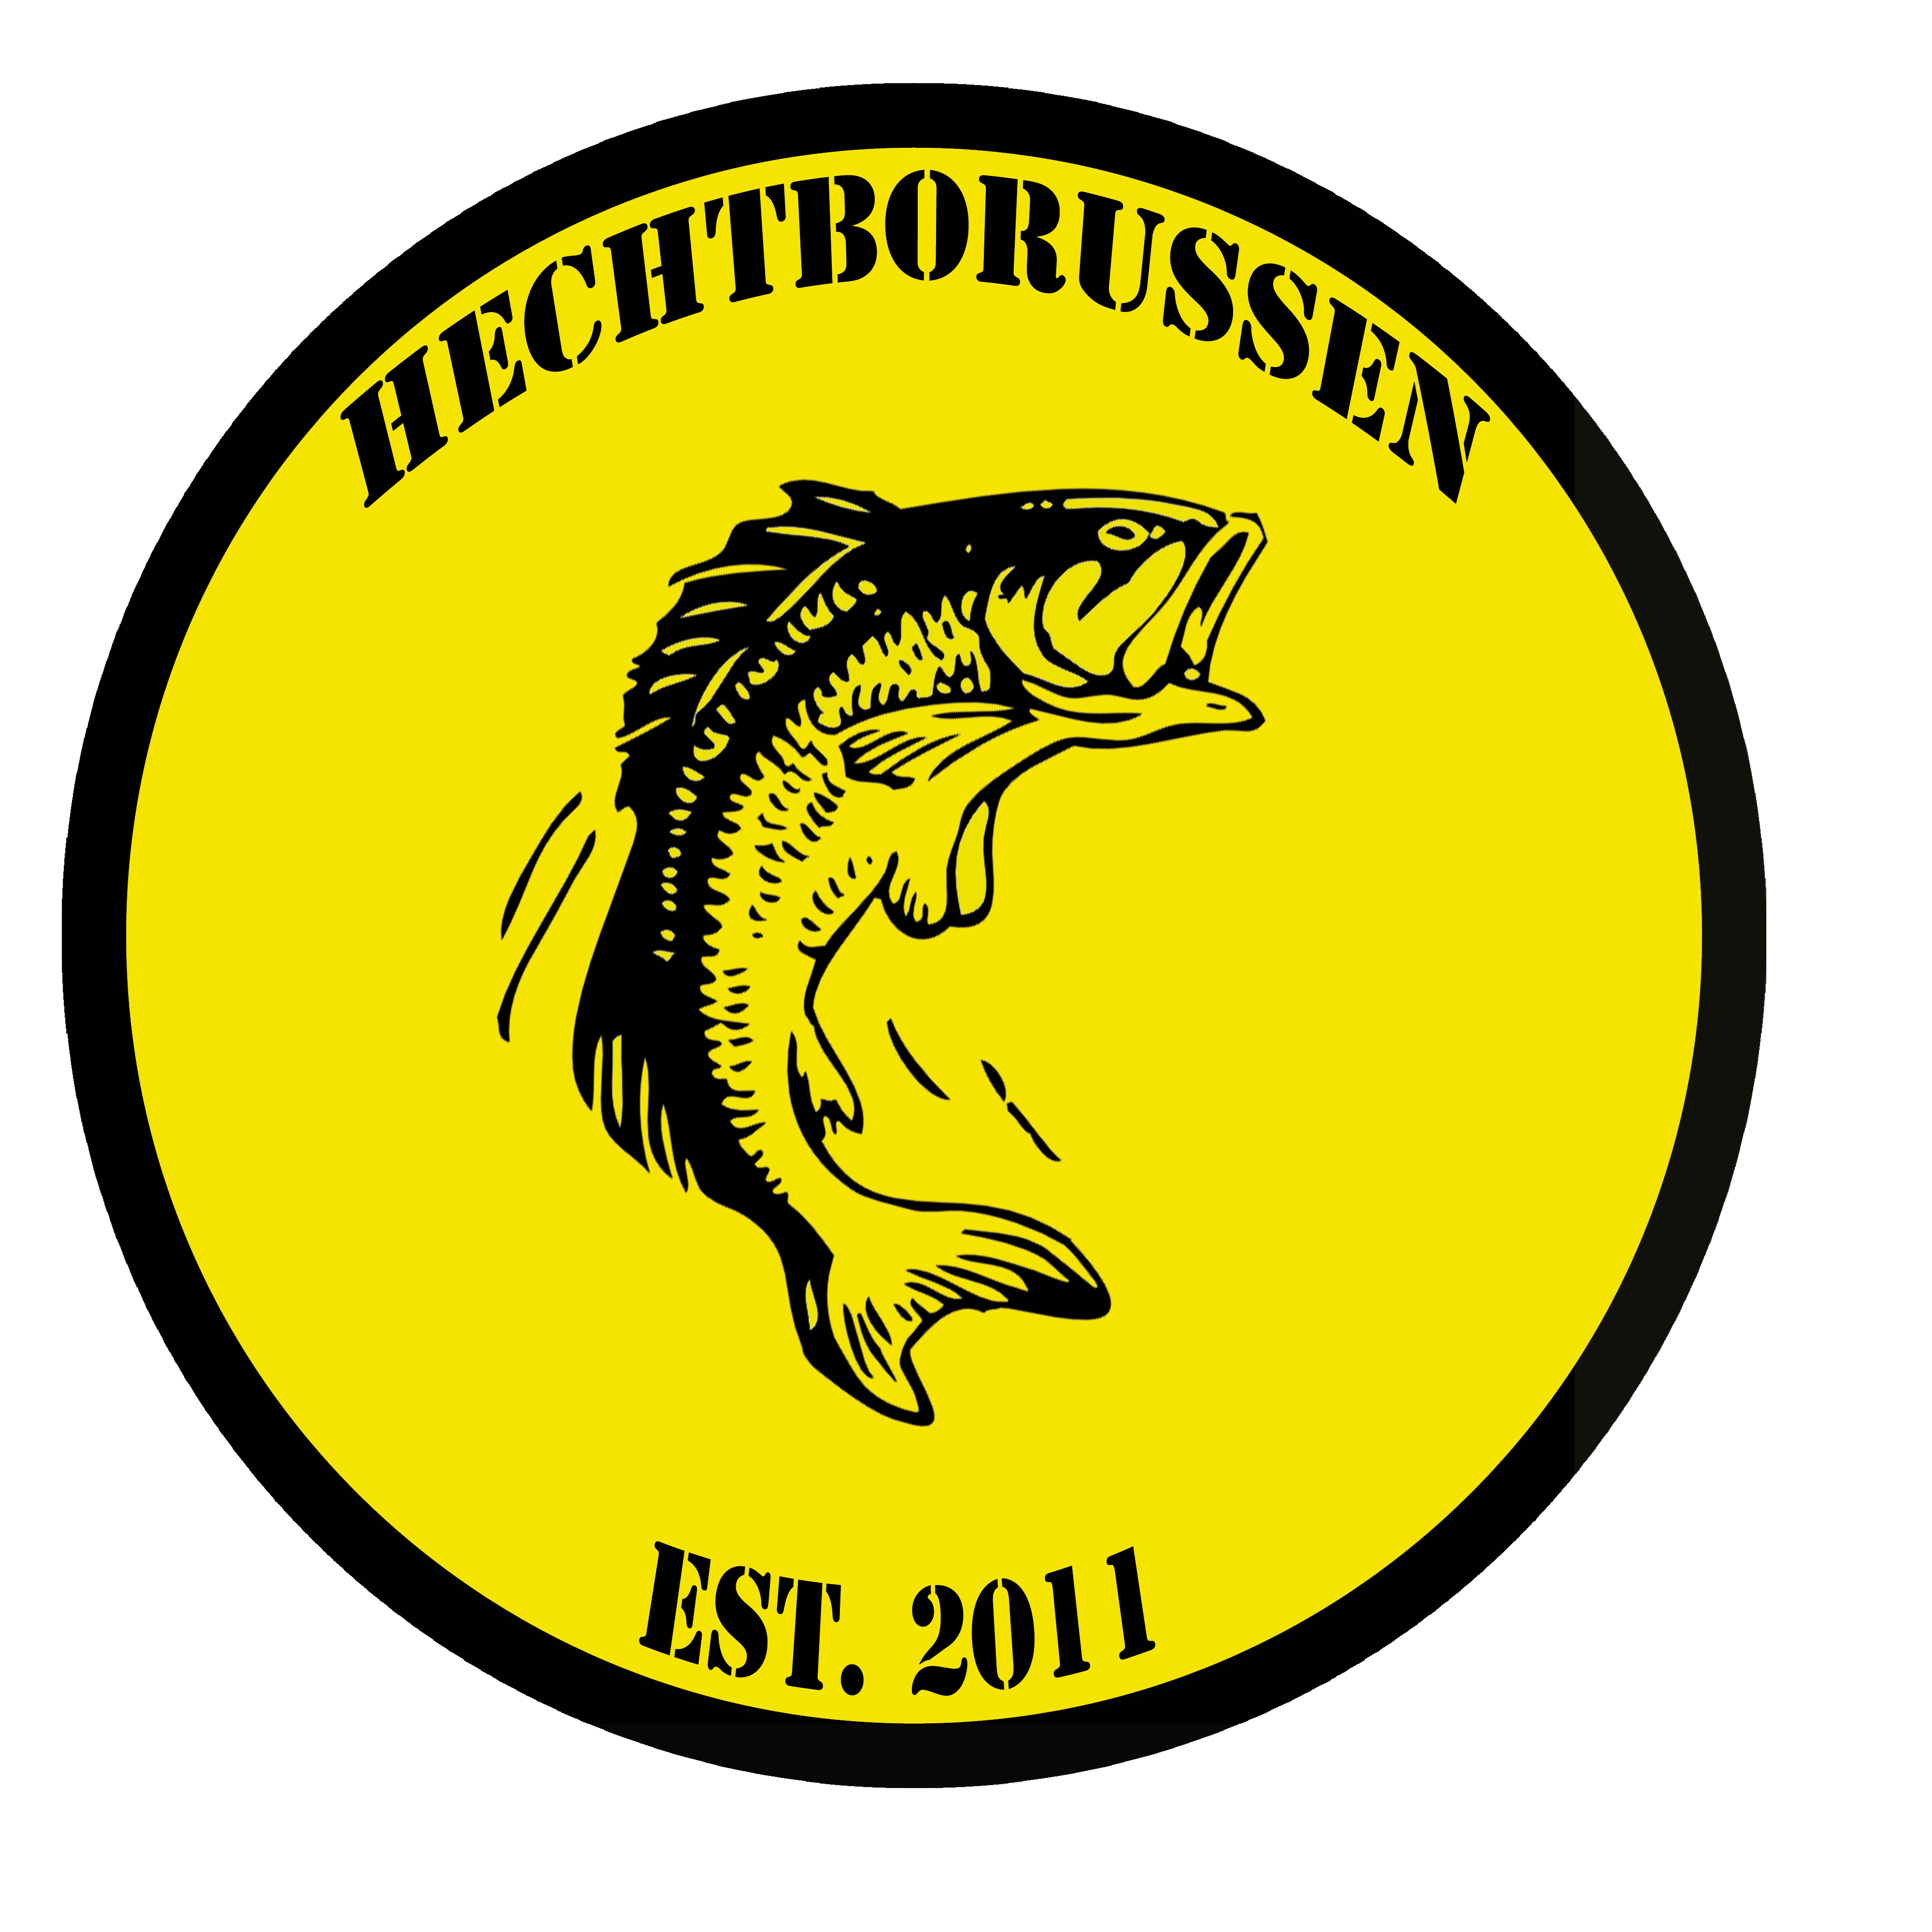 HECHTBORUSSEN Est. 2011